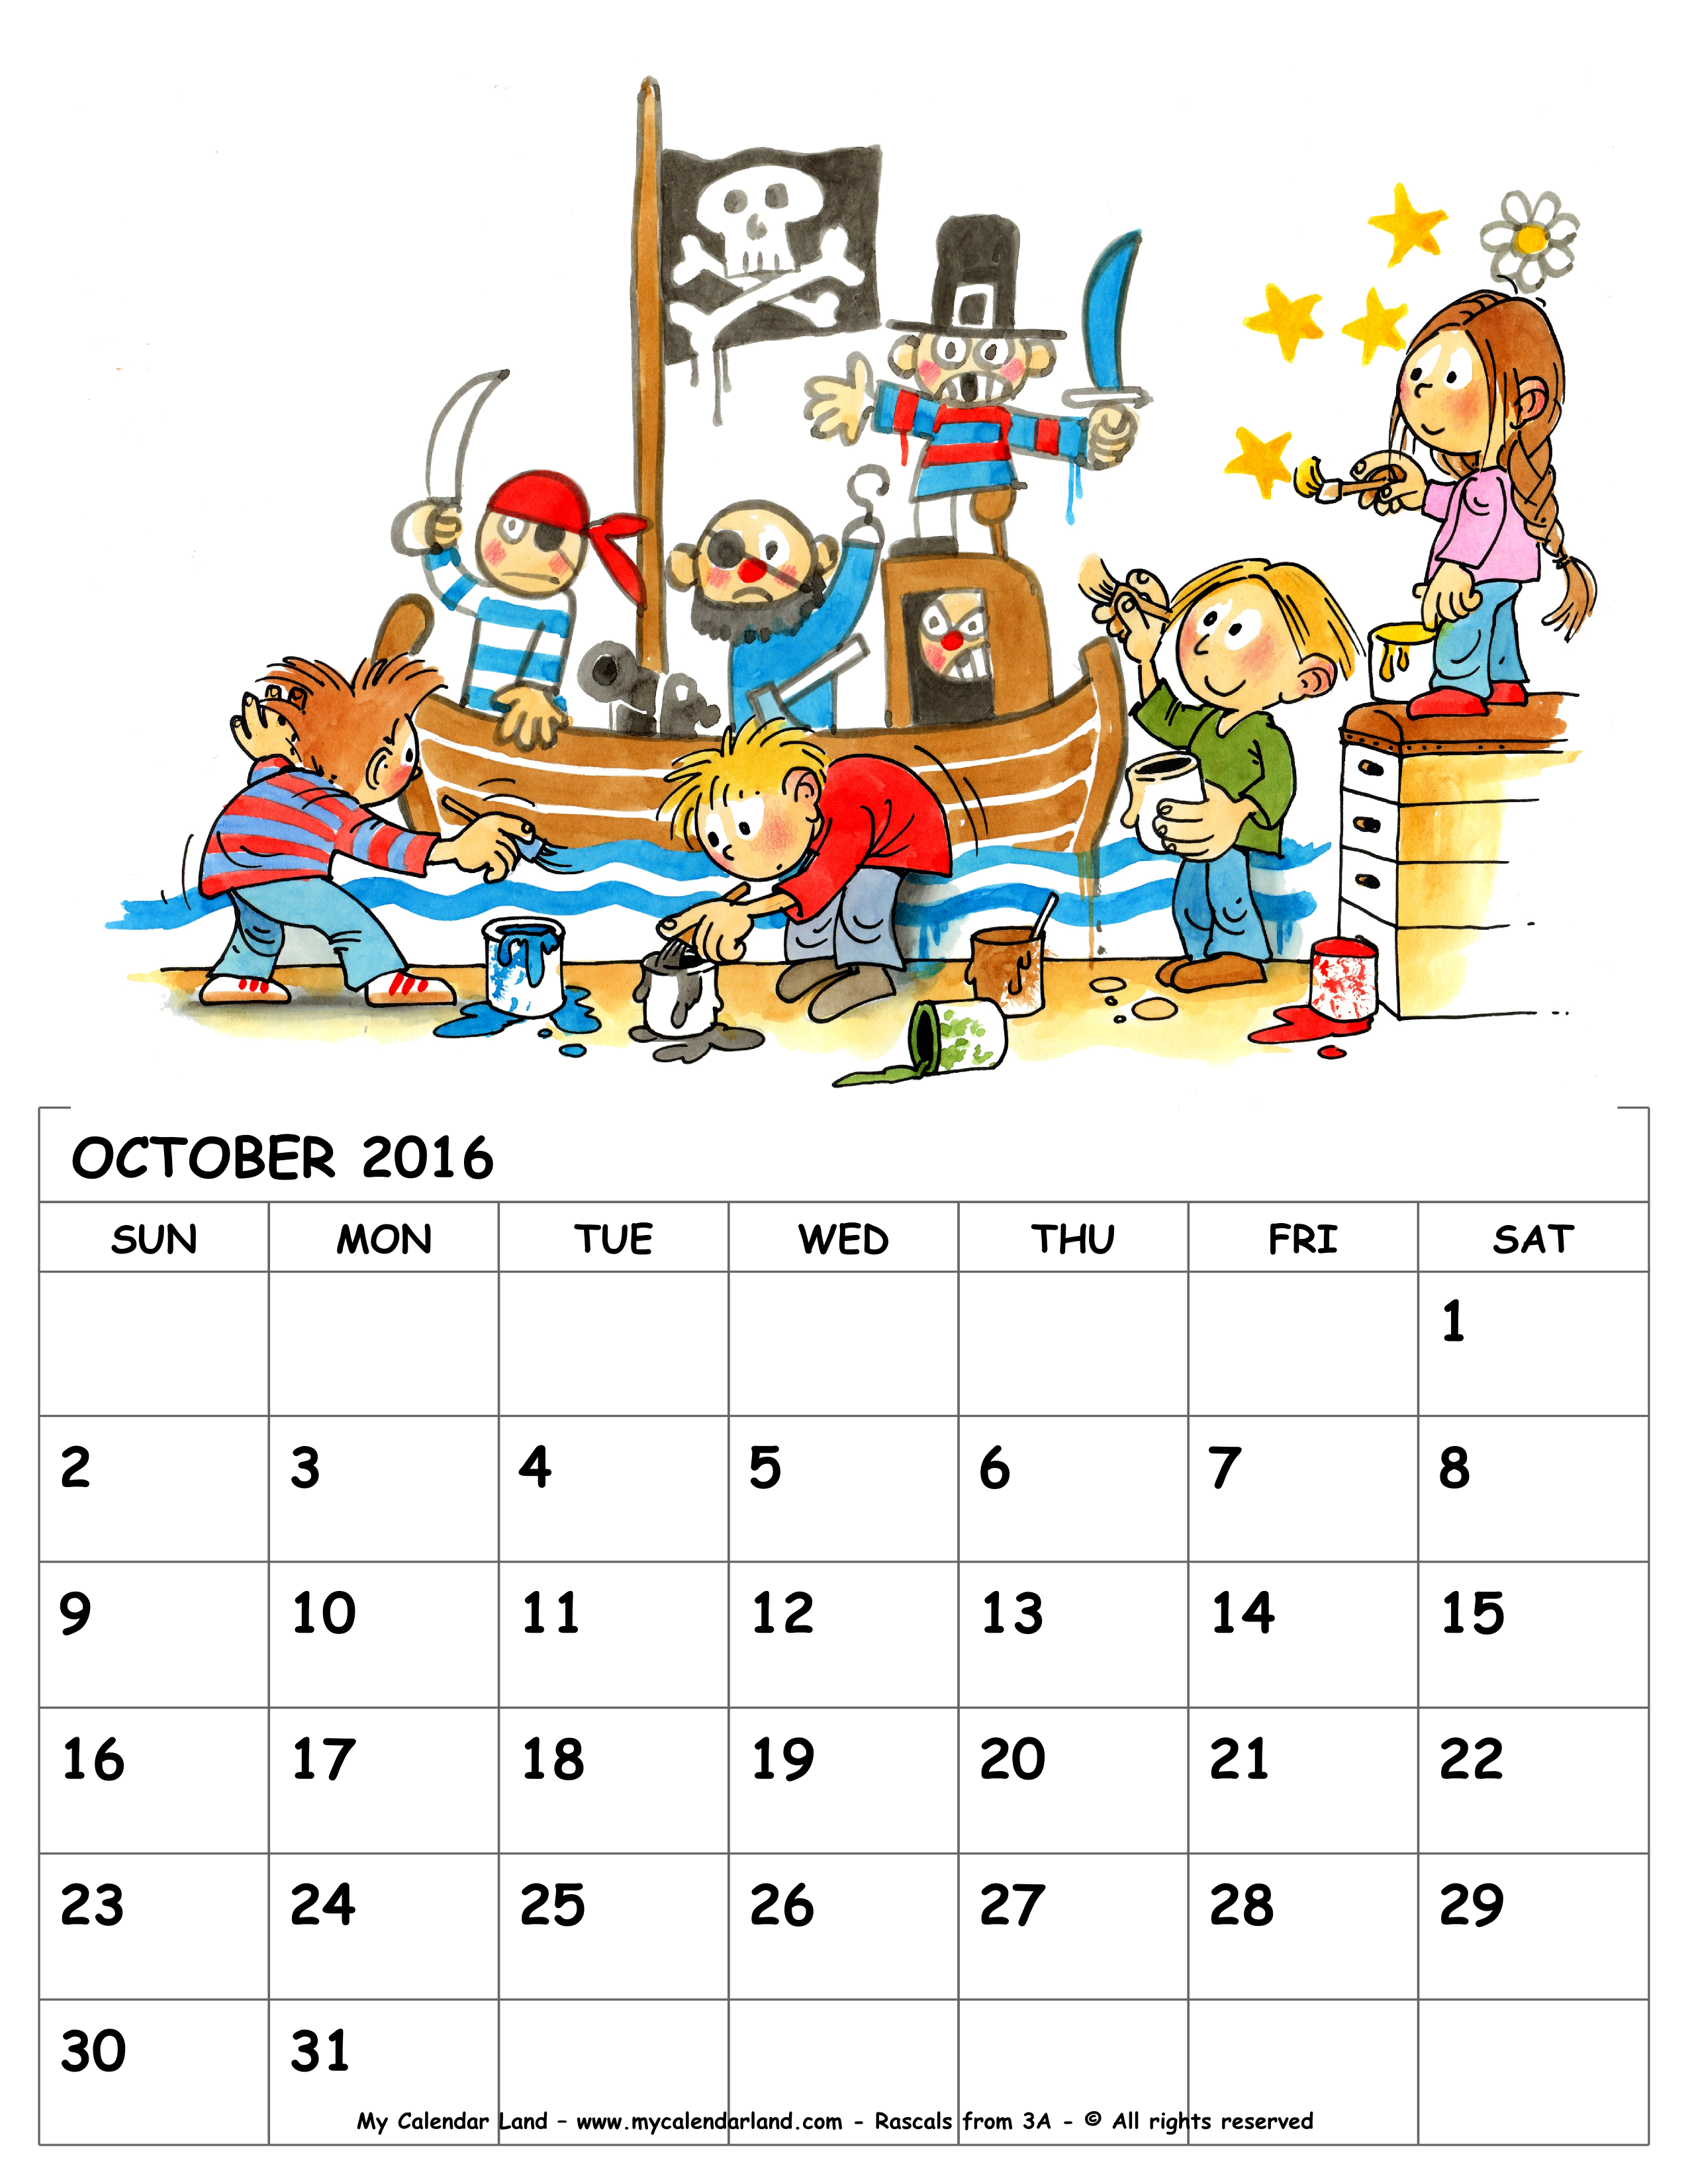 Cute october 2016 clipart png free October 2016 Calendar - My Calendar Land png free